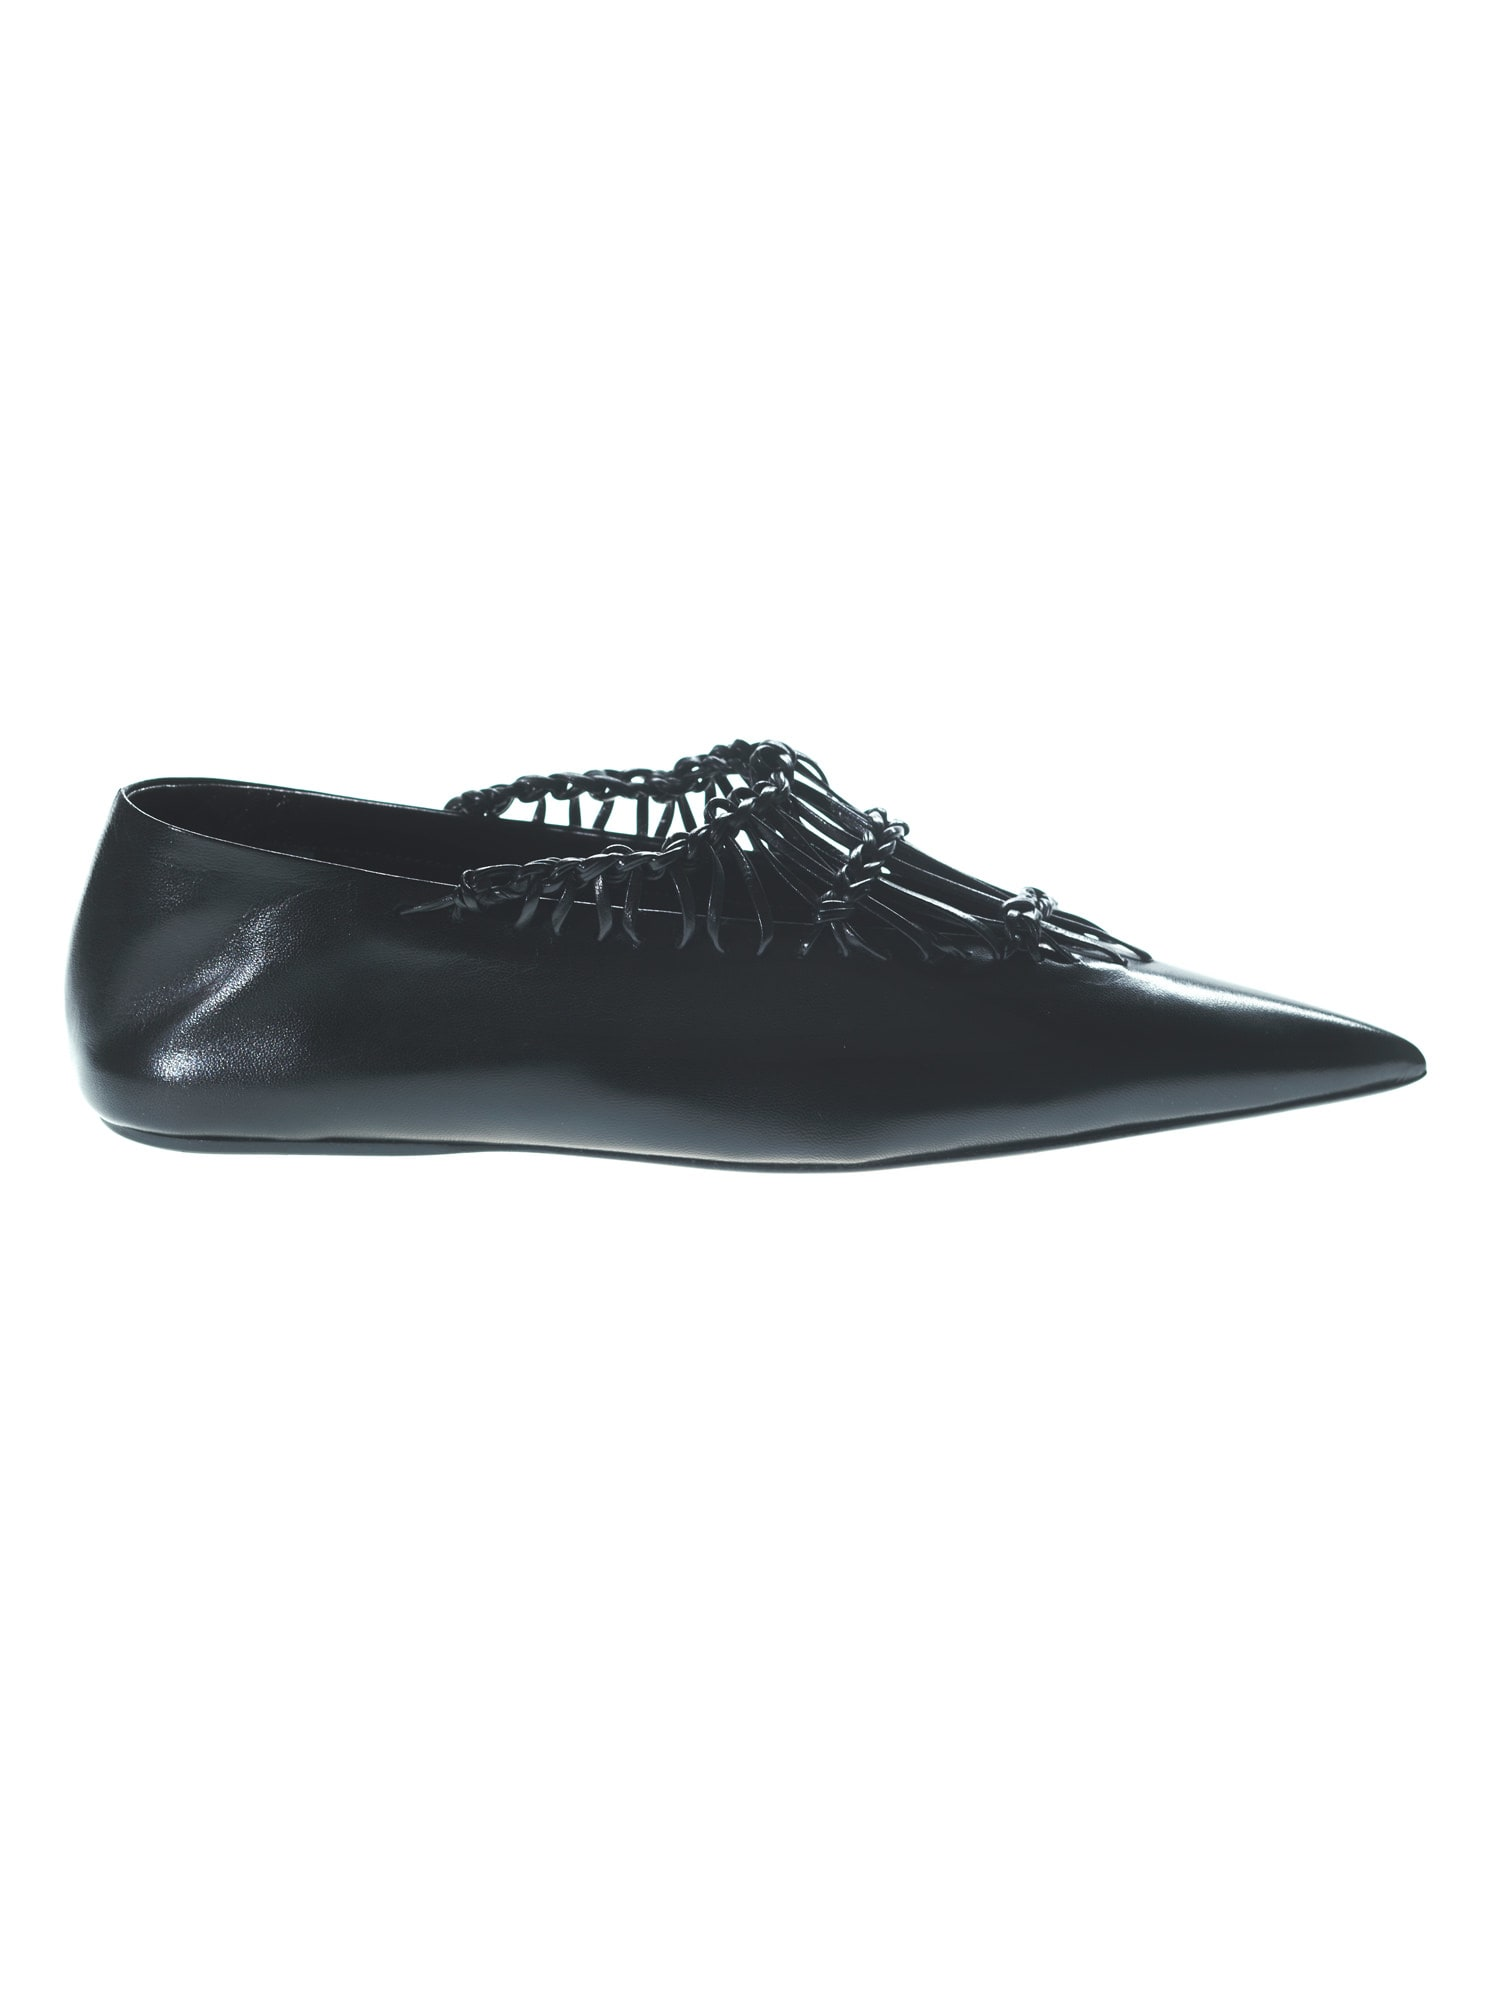 Buy Jil Sander Ballerina Tripon 999 Nero online, shop Jil Sander shoes with free shipping